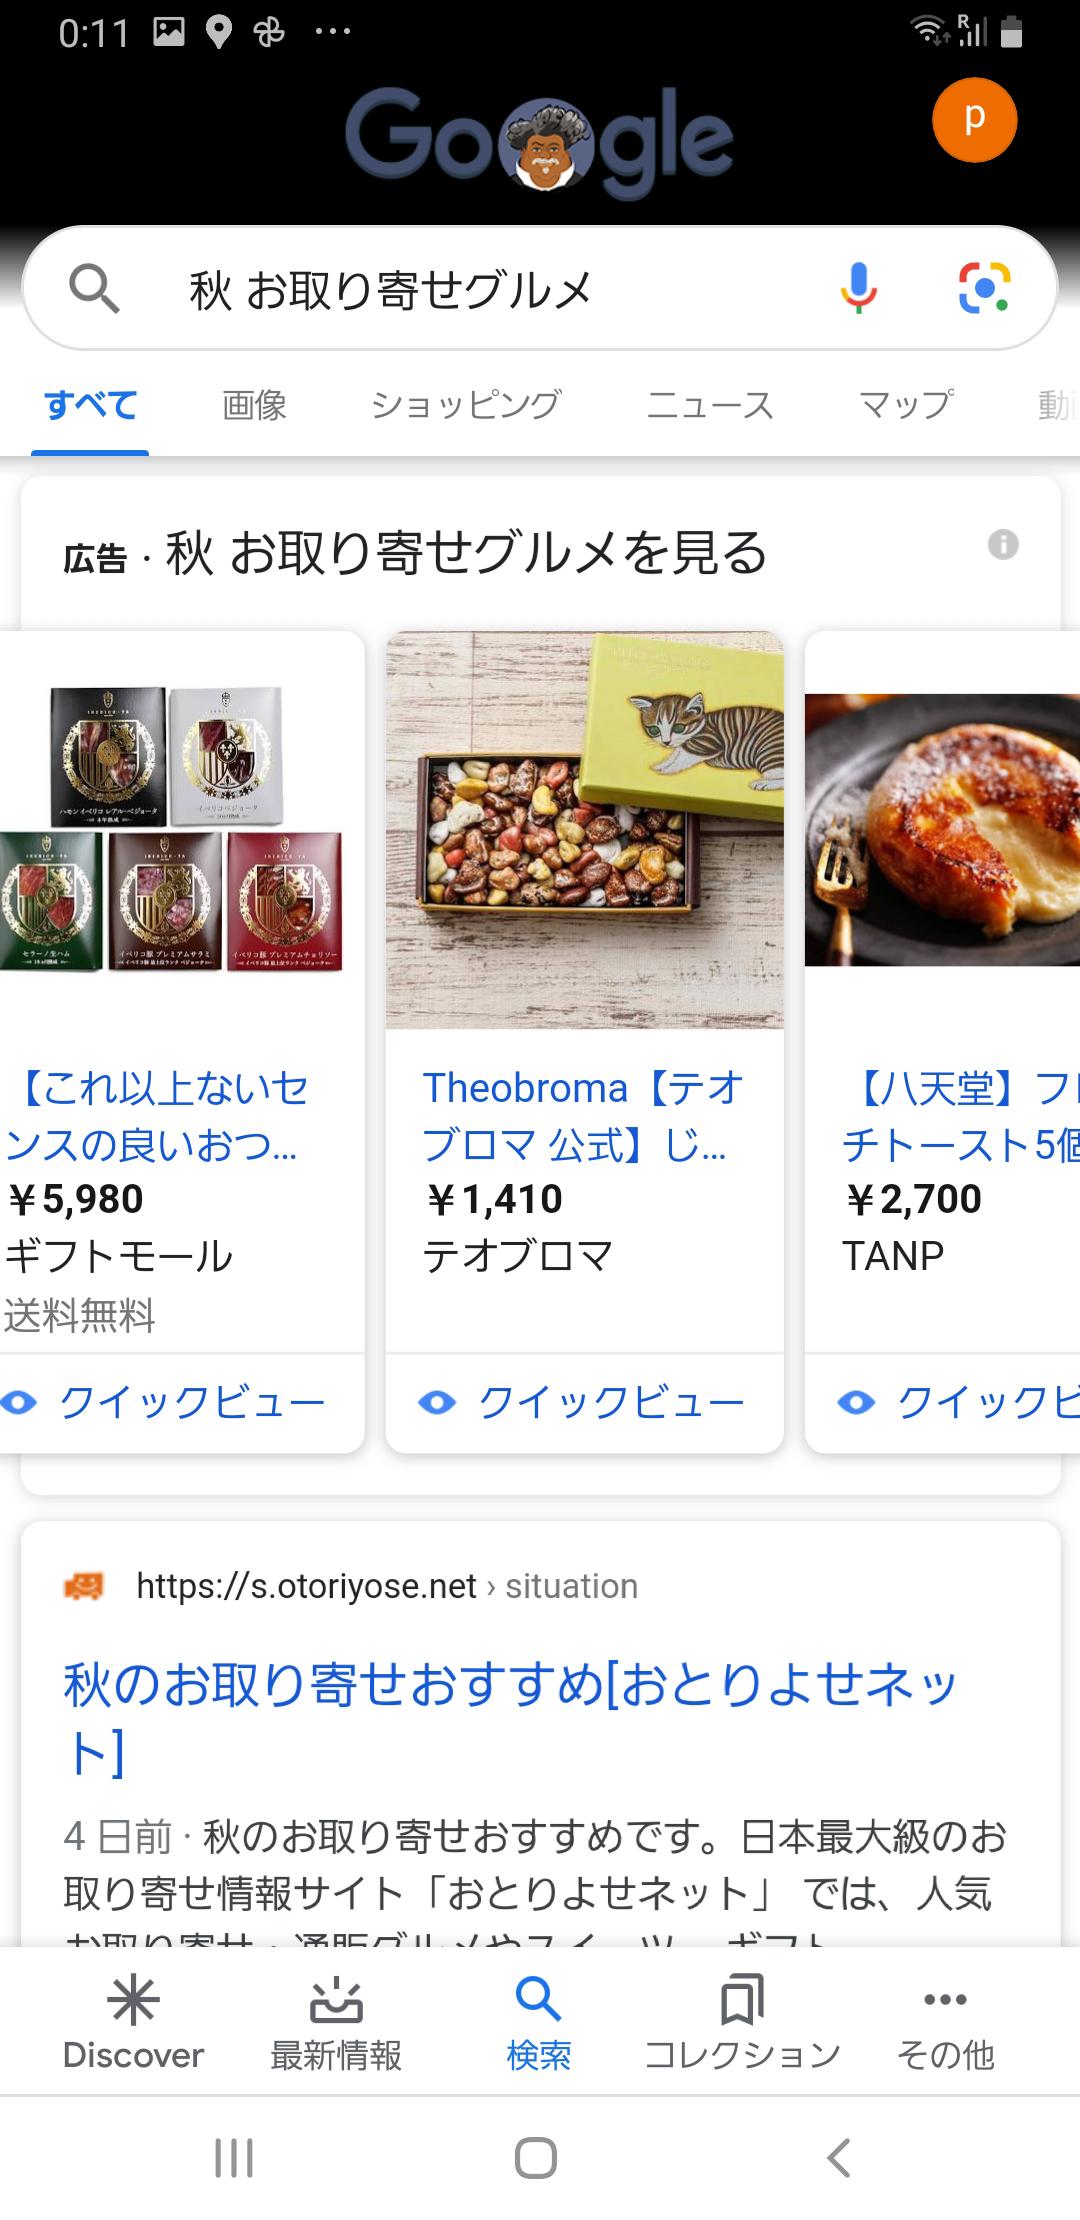 Googleショッピング広告の例